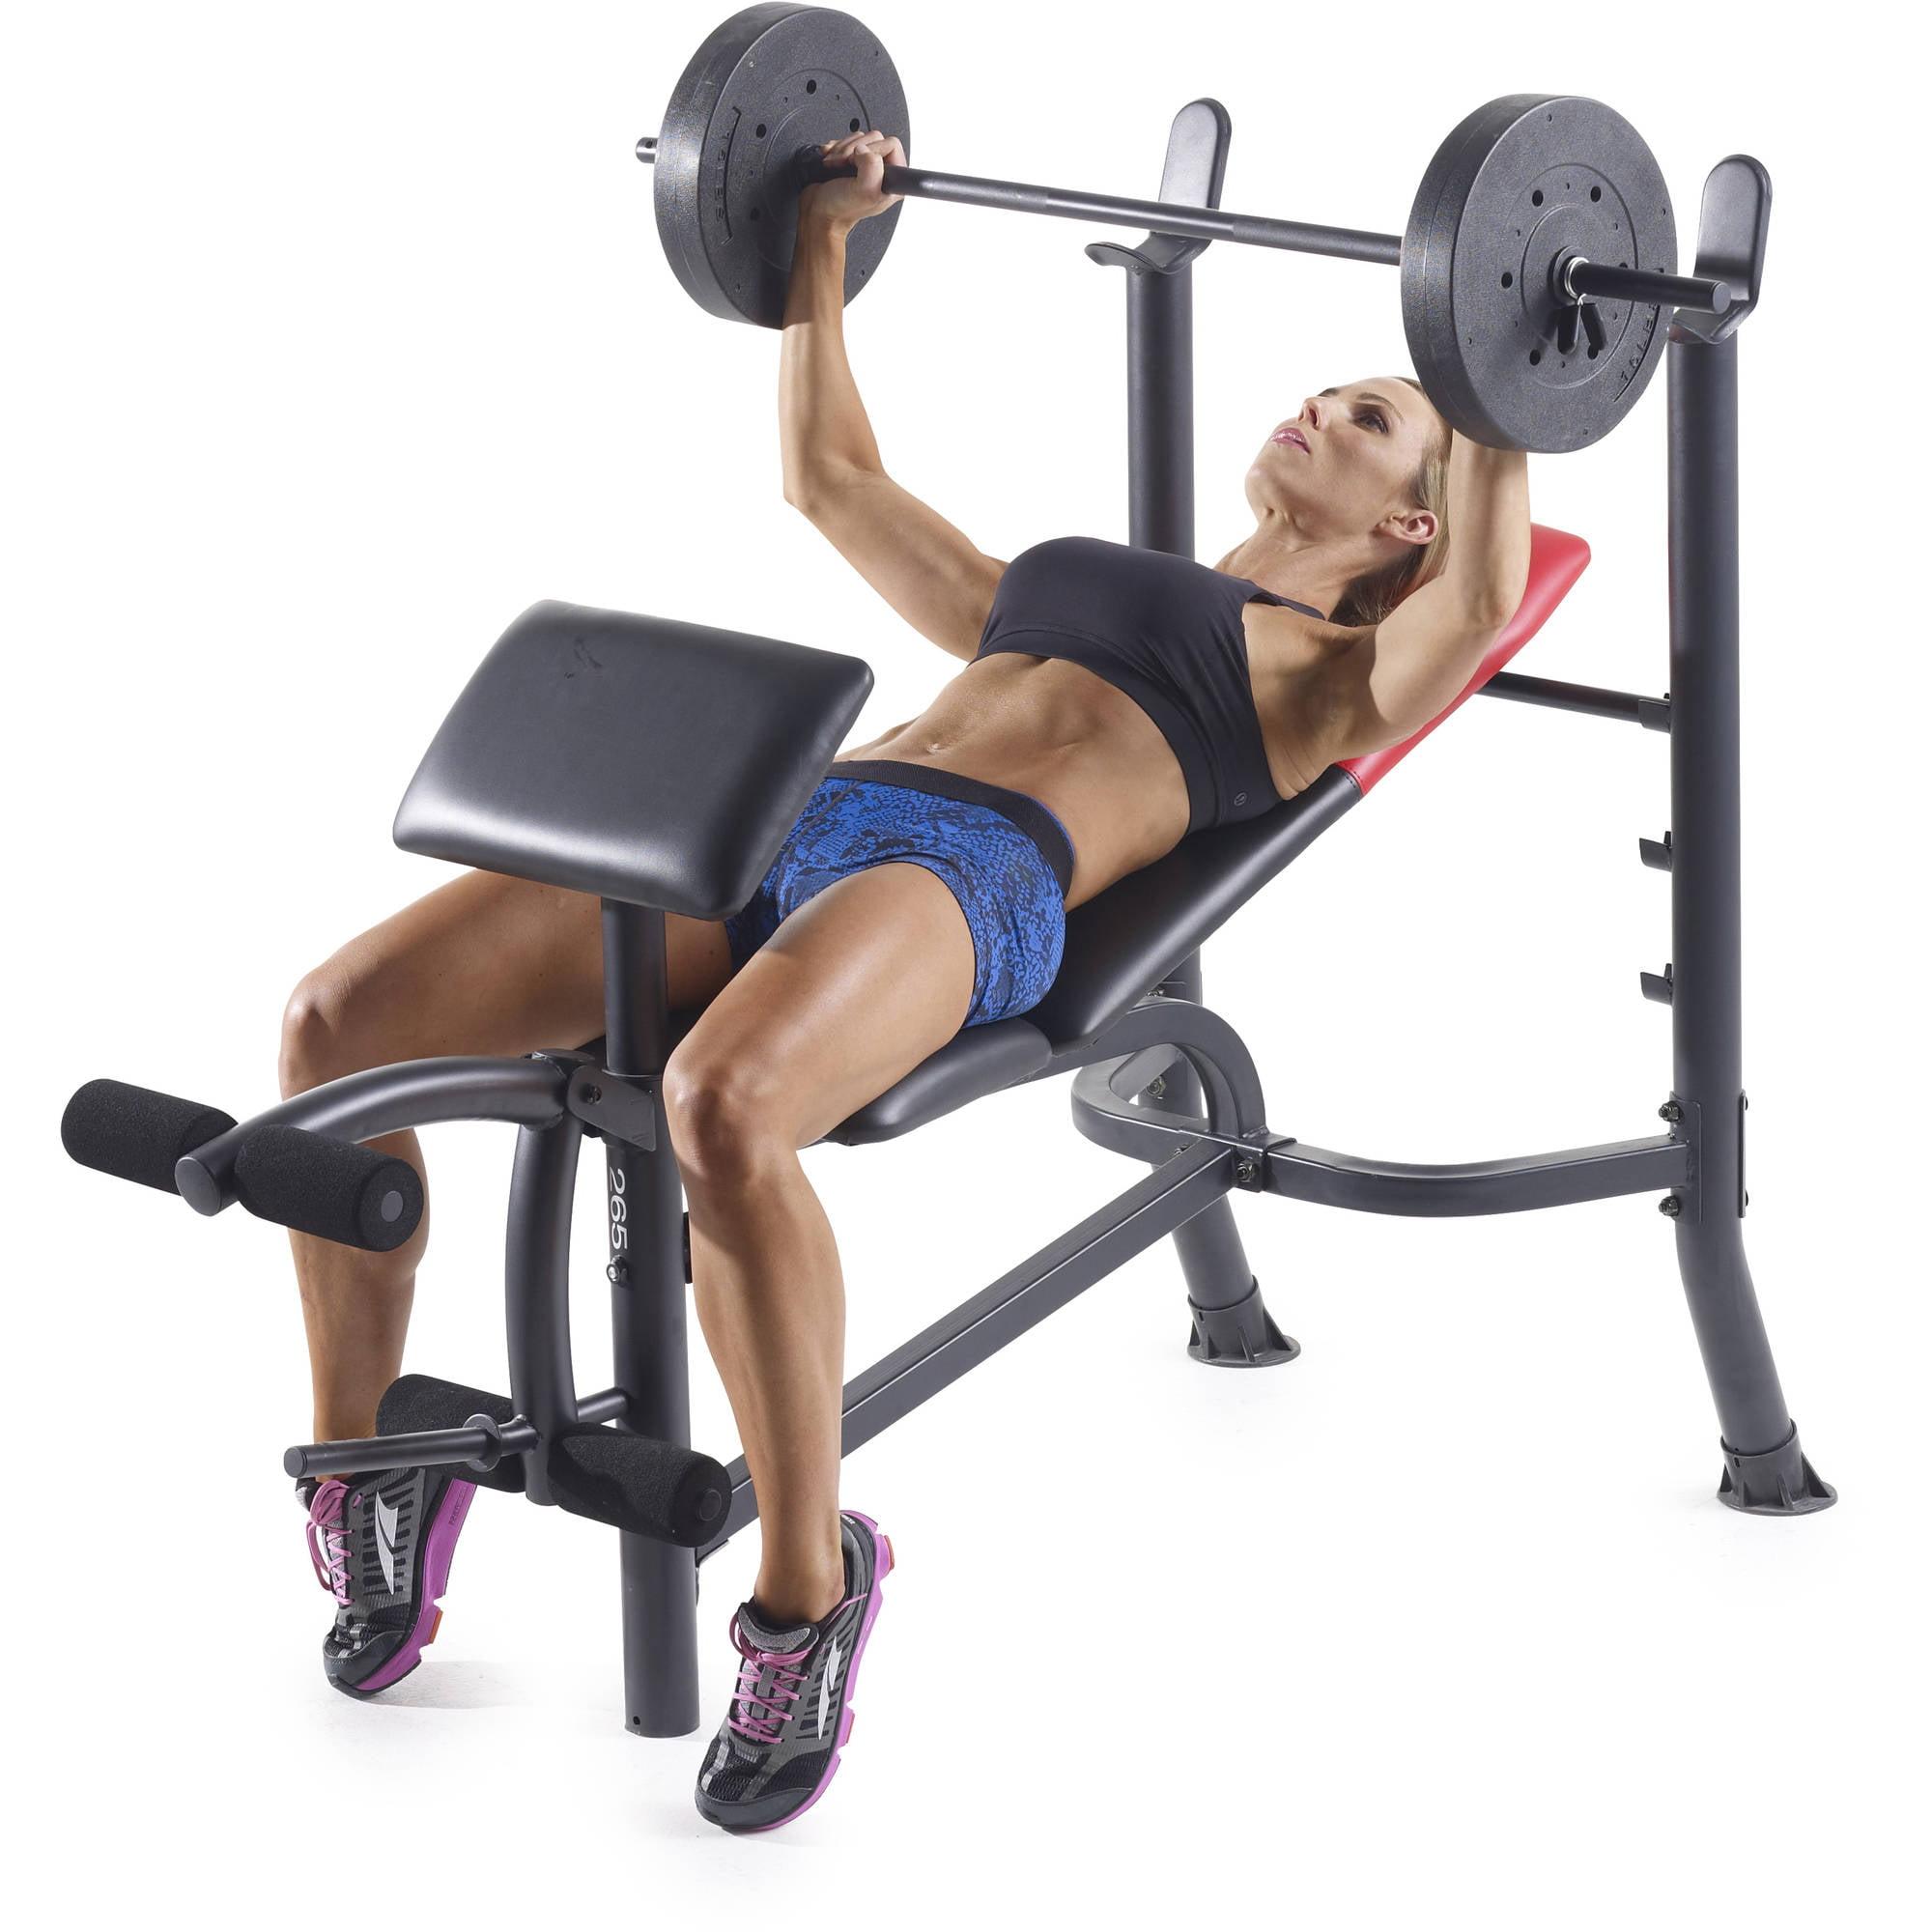 details weight lifting bench set